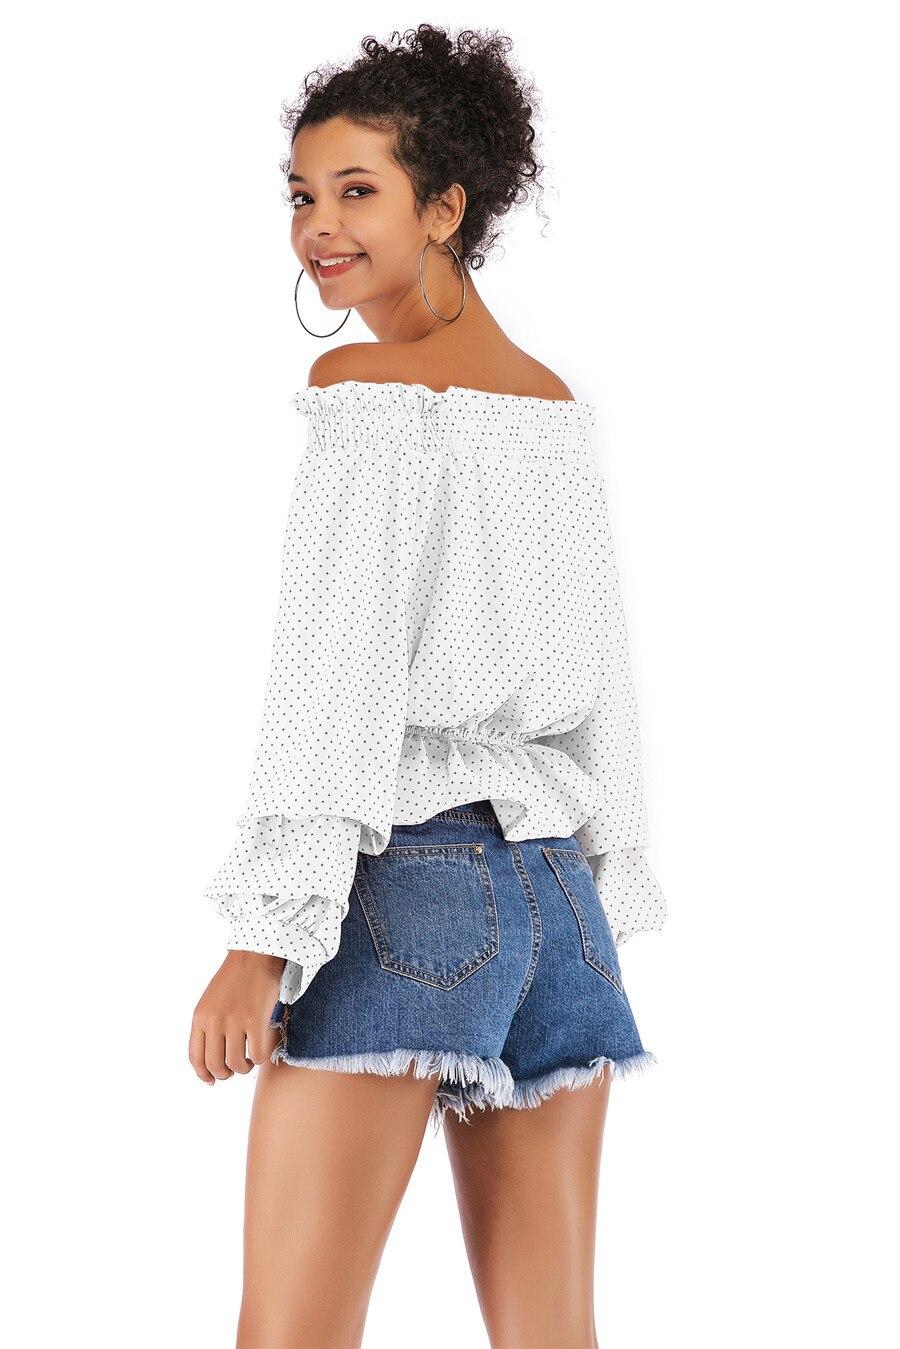 Gladiolus Chiffon Blouse Women 2019 Spring Autumn Long Sleeve Polka Dot Off Shoulder Sexy Blouses Women Shirts Ruffles Blusas (24)